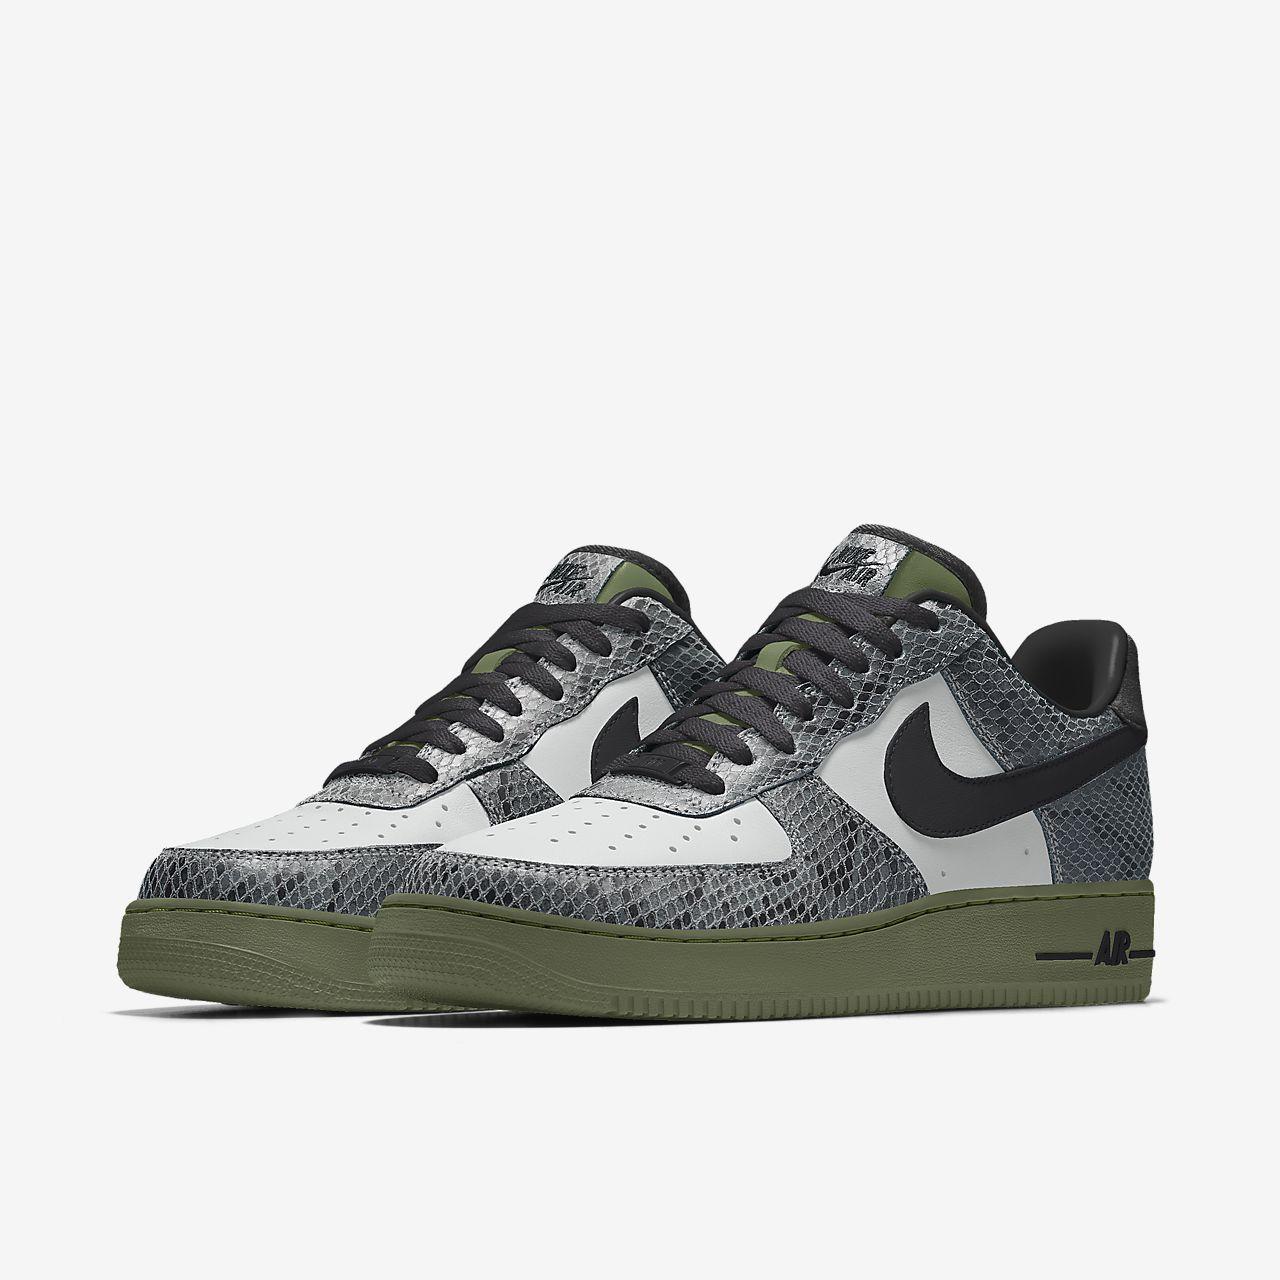 Nike Air Force 1 Low Unlocked By You Custom Men's Shoe